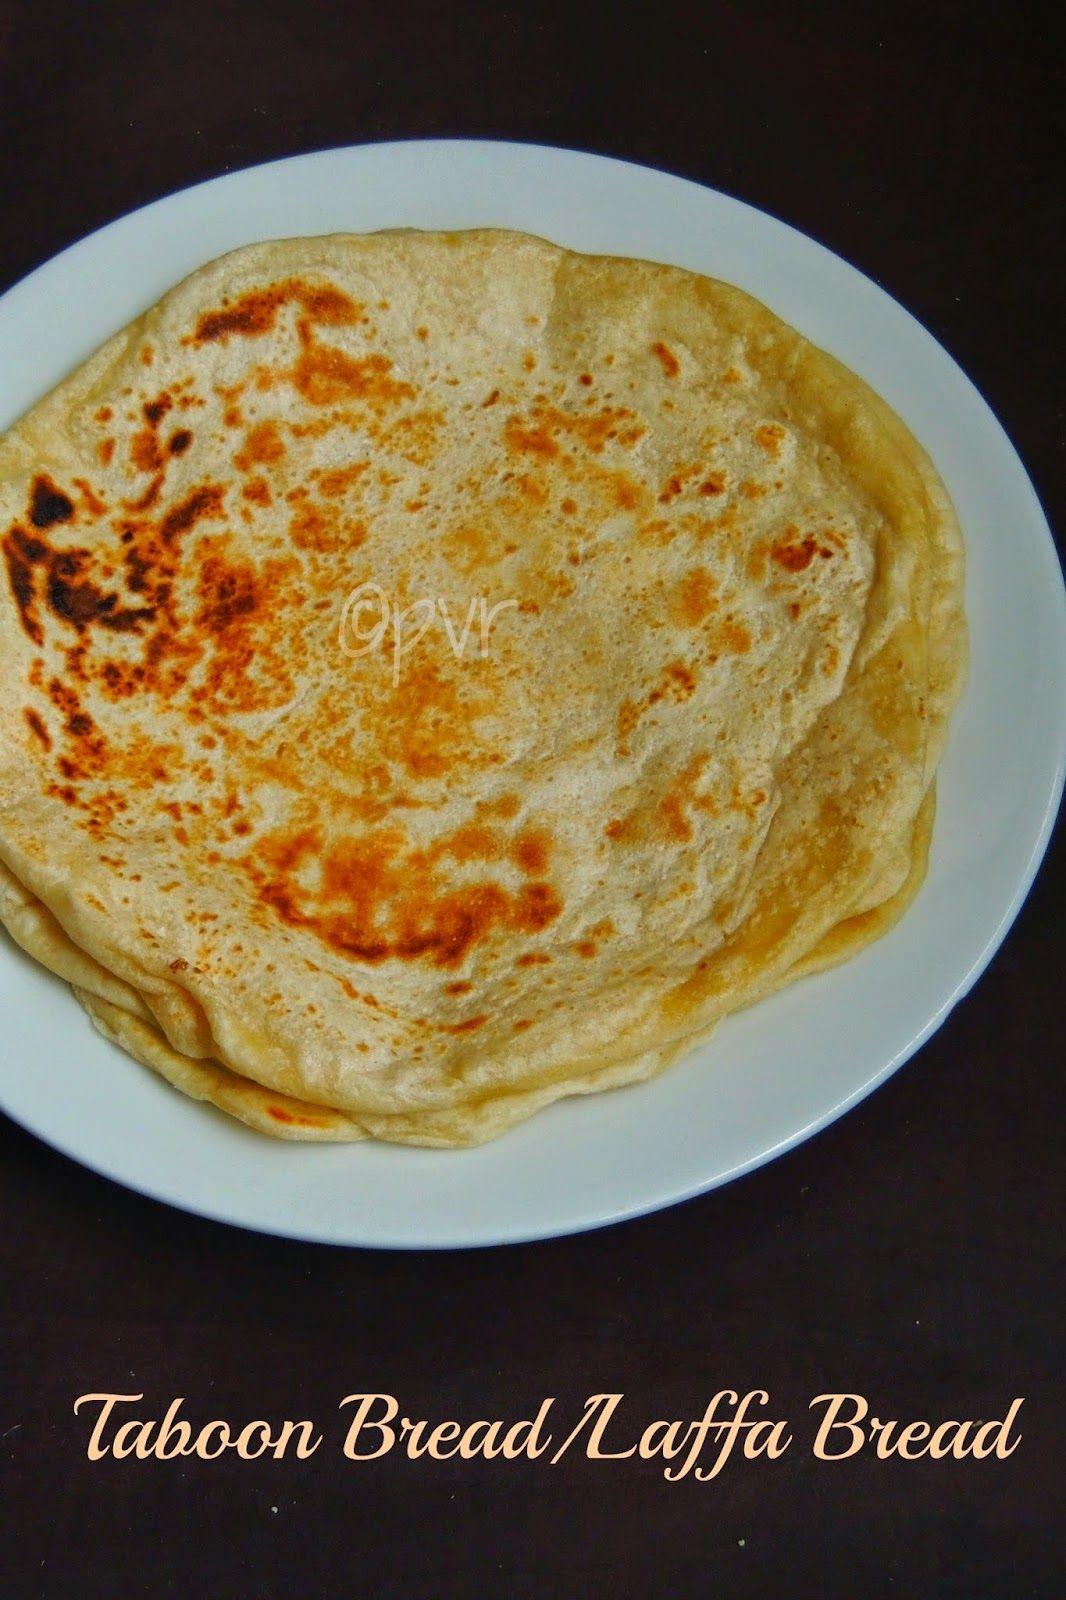 Taboonjordanian taboon bread jordanian cuisine cuisine food forumfinder Choice Image